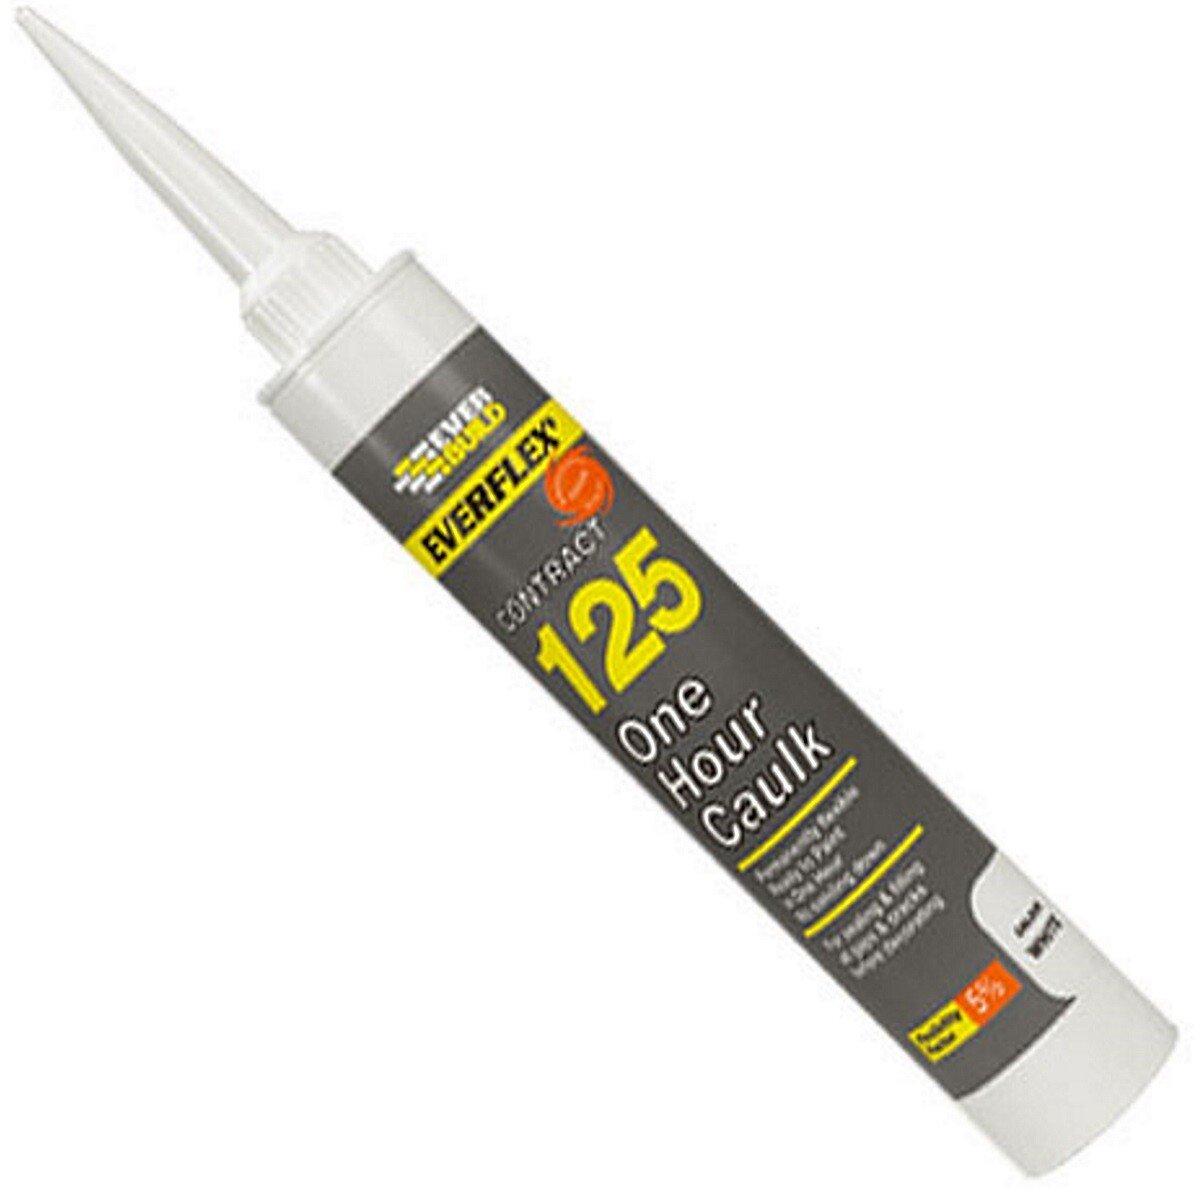 Everbuild 125C3 One Hour Painter's White Caulk 310ml